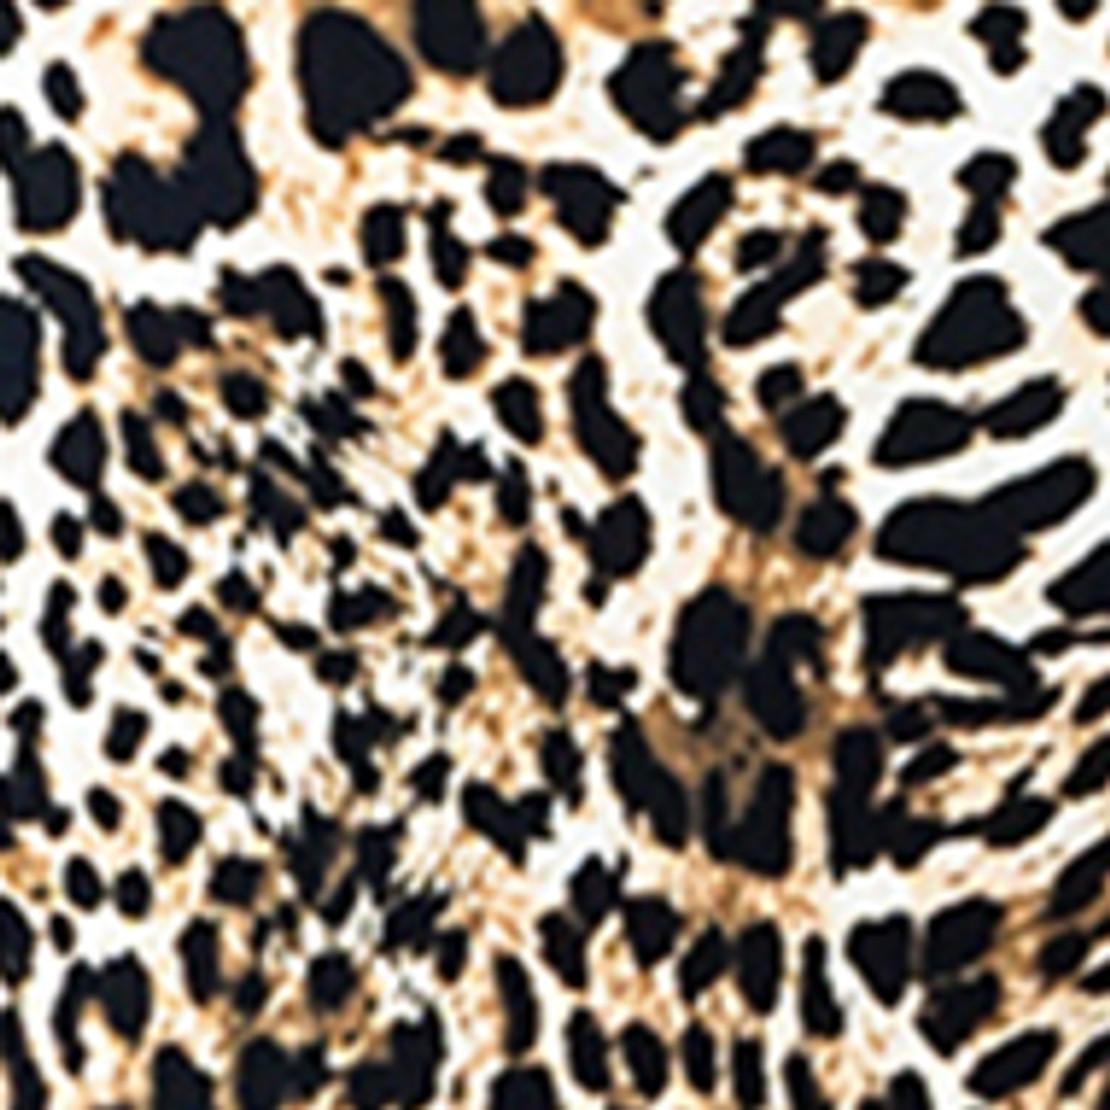 Let's get fierce: Why we love leopard